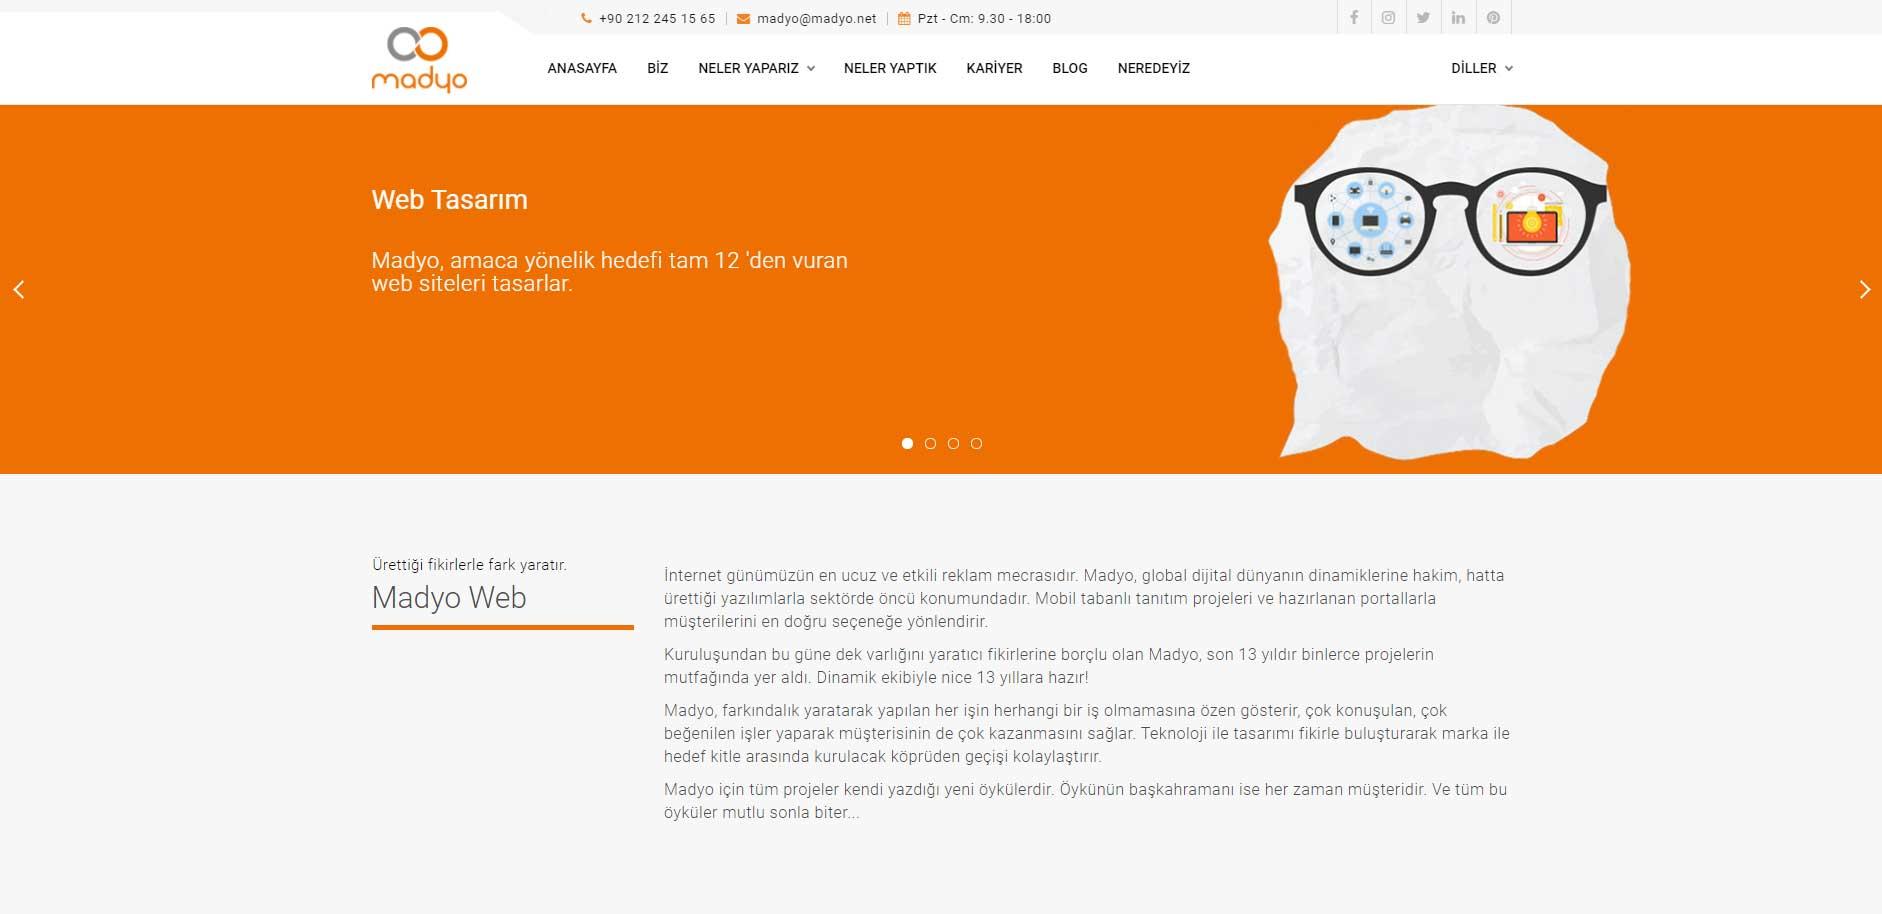 Web Tasarım - Admin Paneli